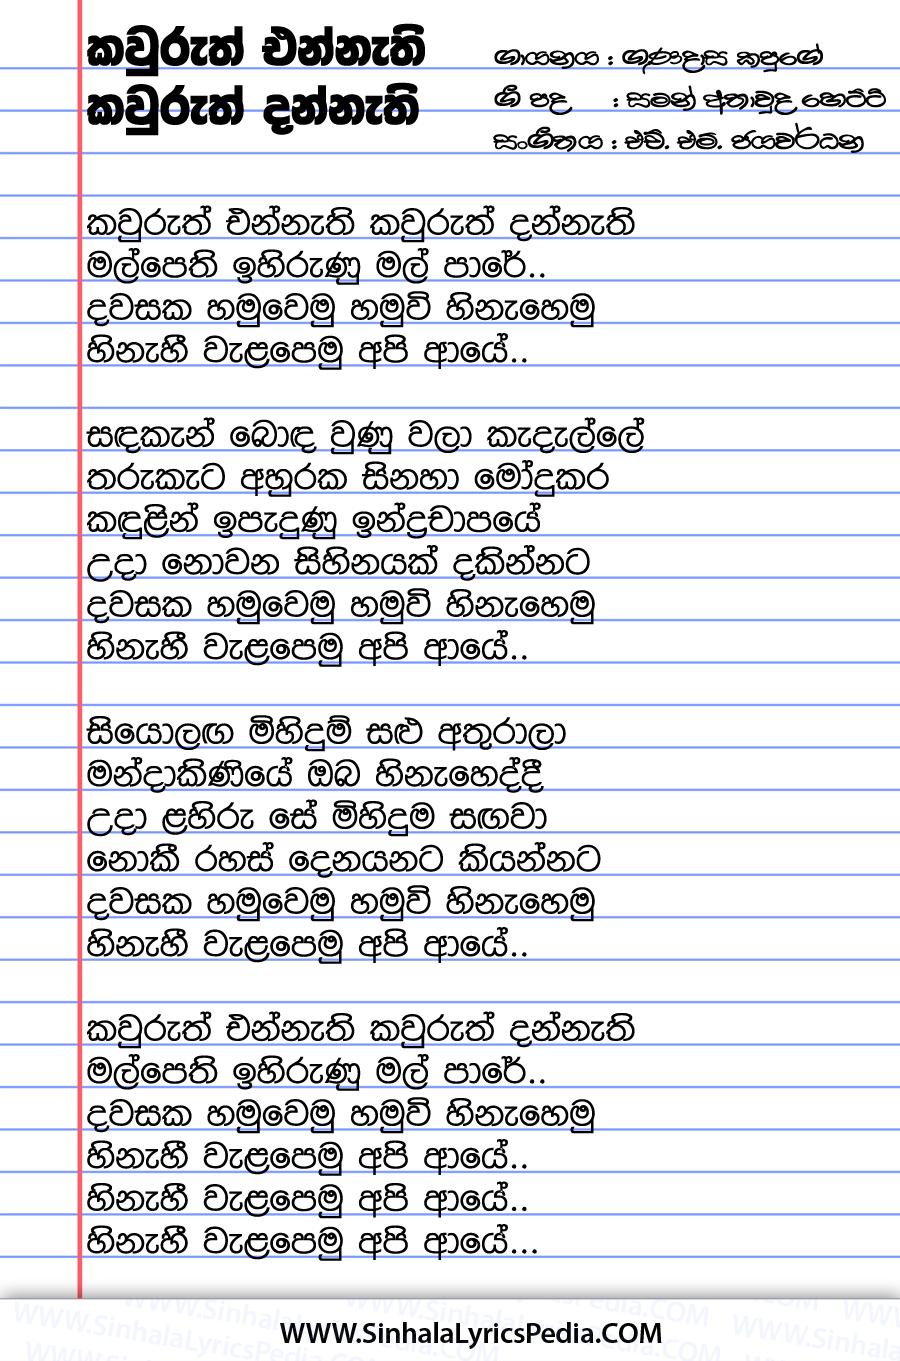 Kawruth Ennathi Kawruth Dannathi Song Lyrics